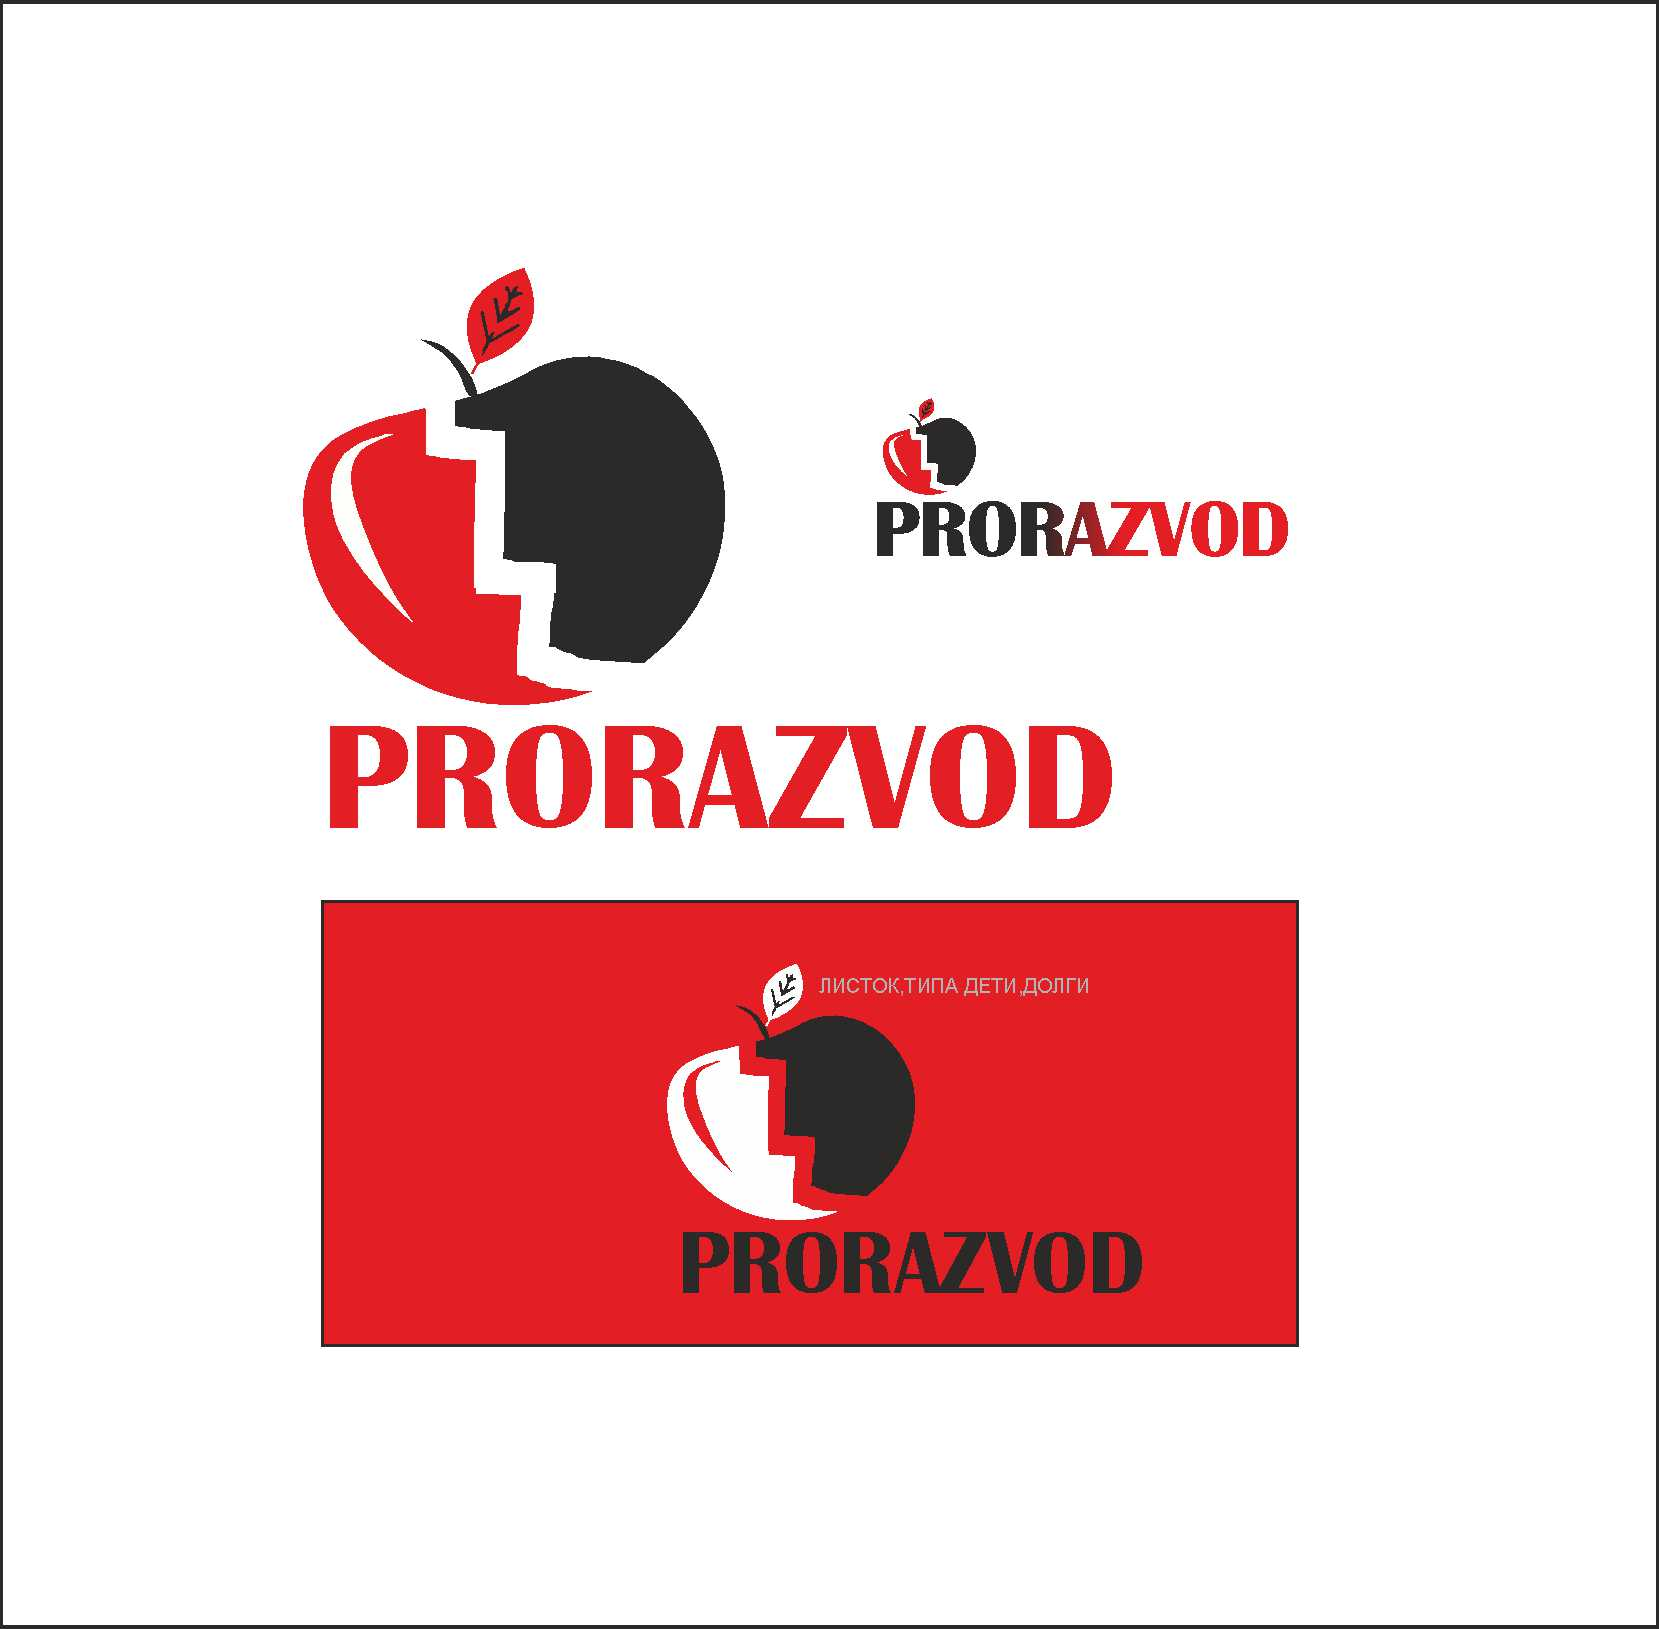 Логотип и фирм стиль для бракоразводного агенства. фото f_8545875e94ab9293.jpg